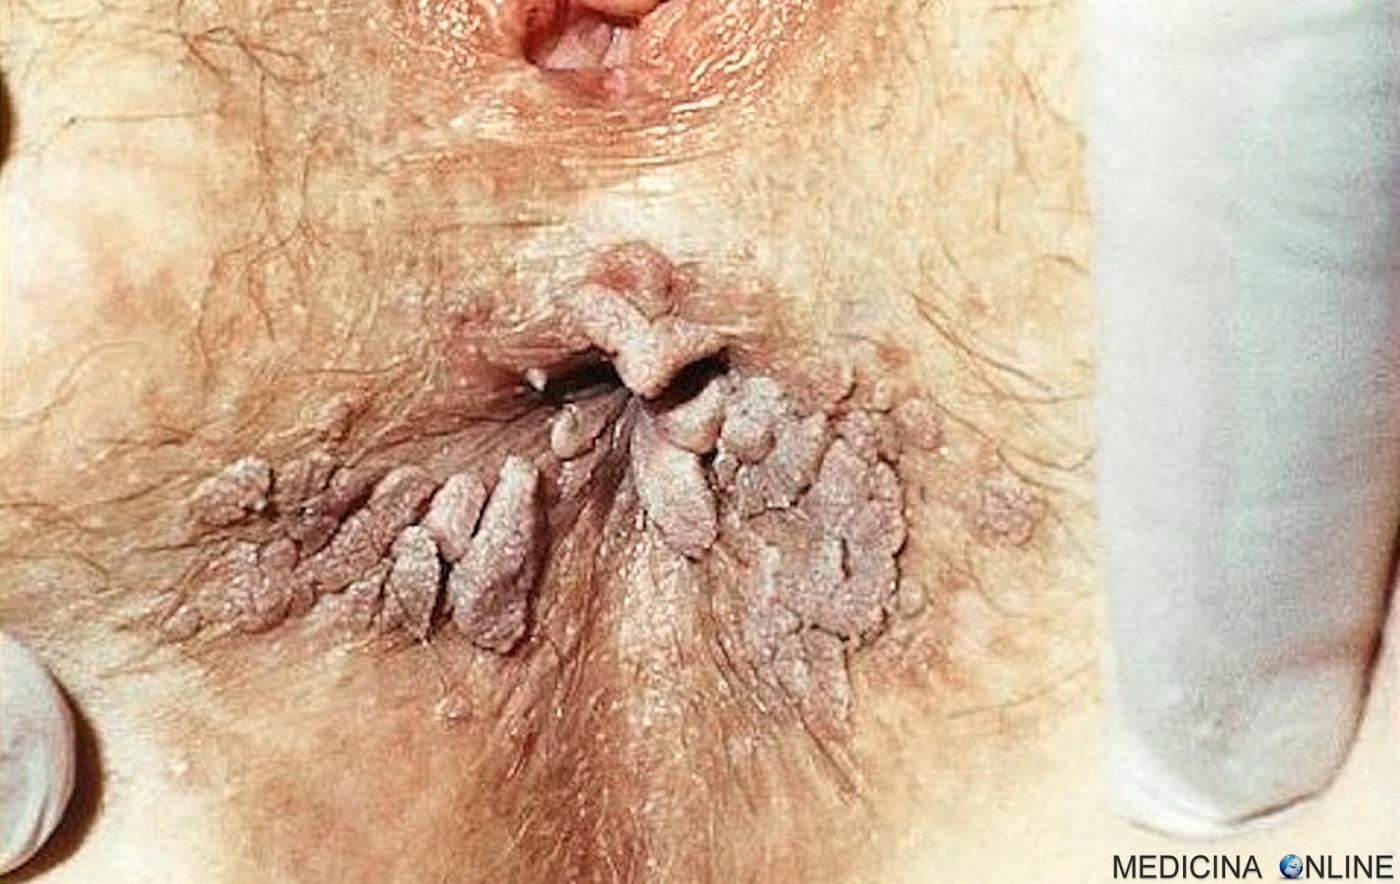 Infezione papilloma virus sintomi - pcmaster.ro